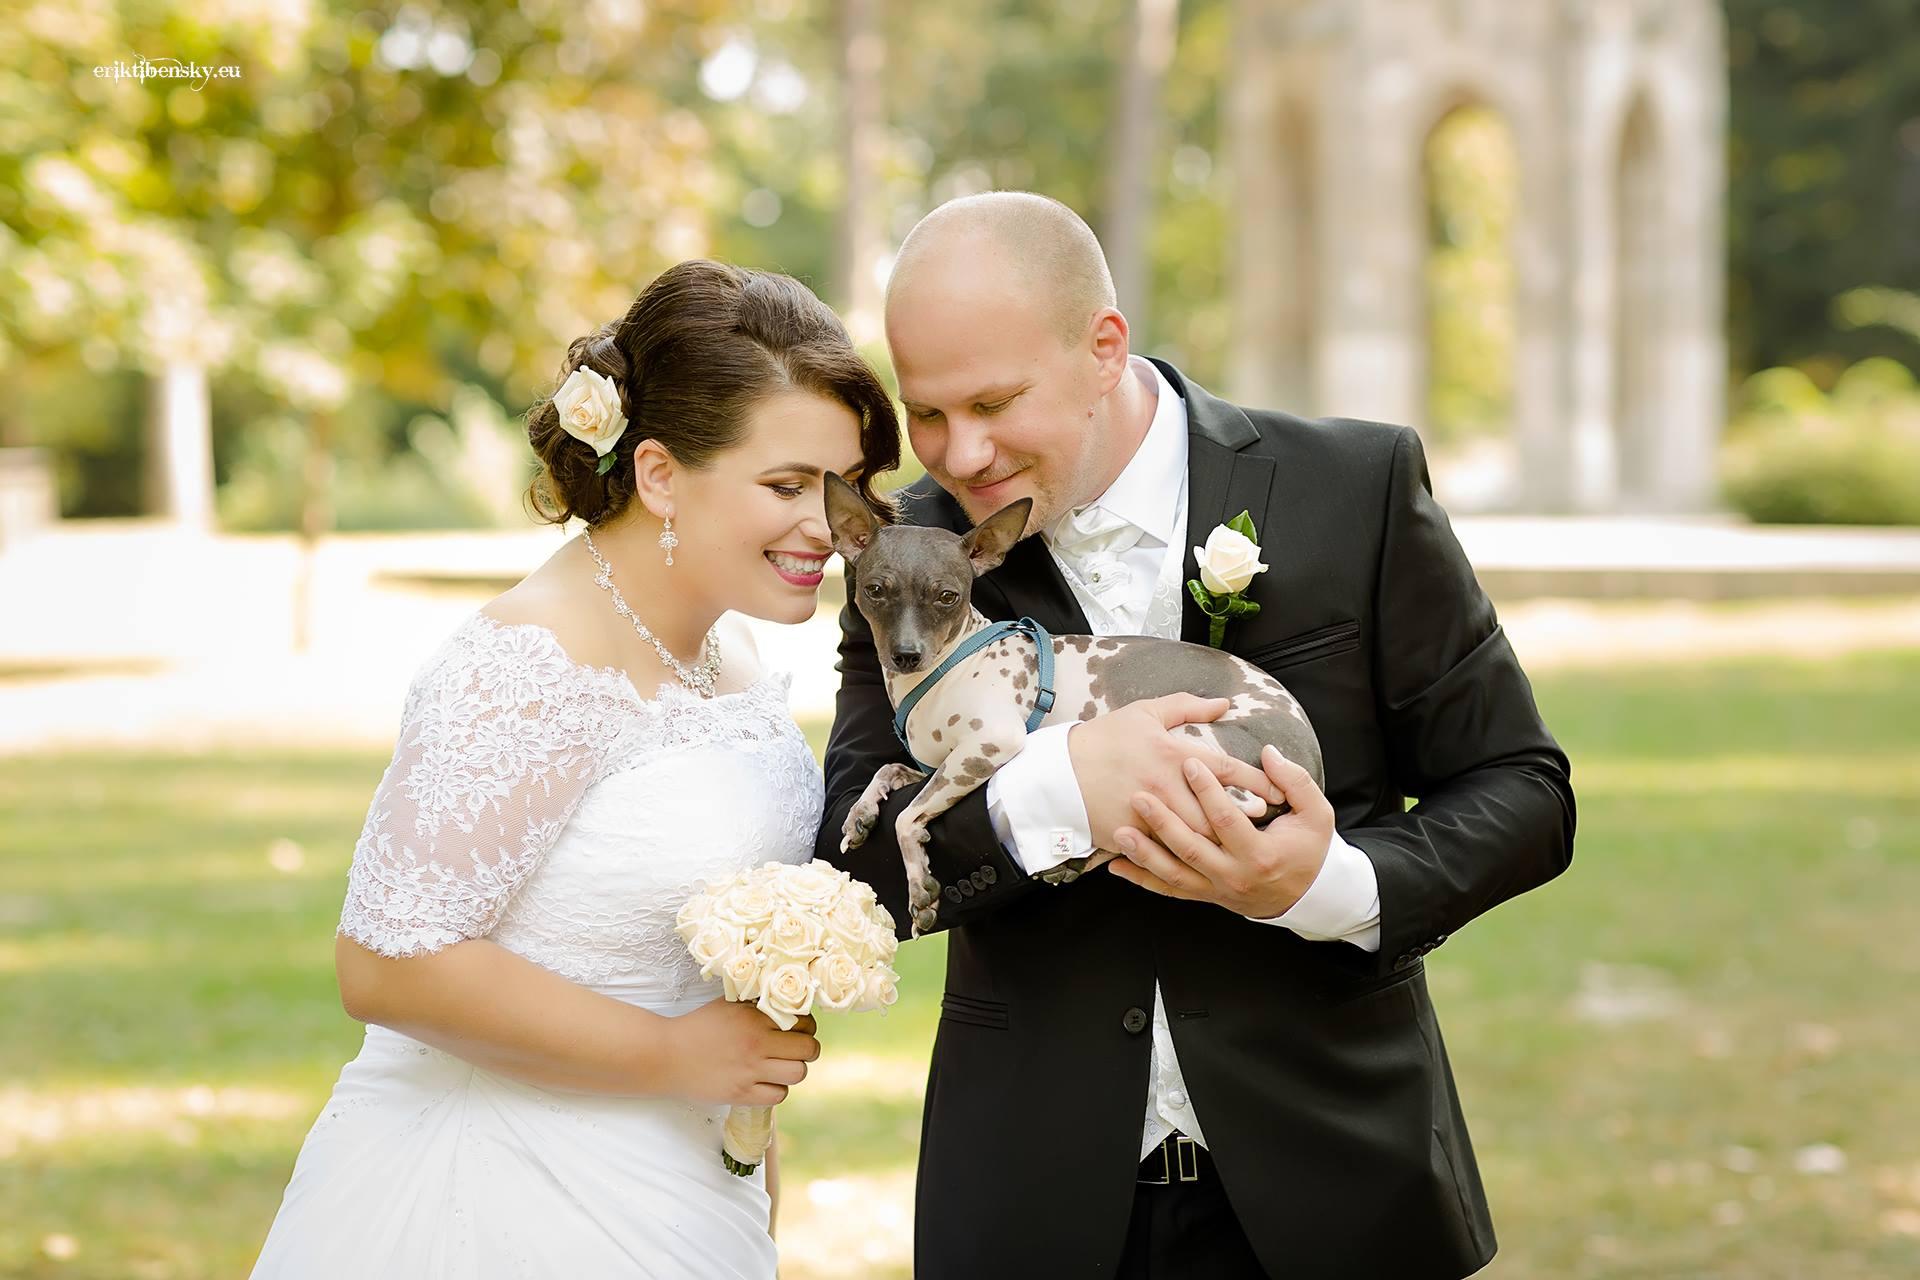 eriktibensky-eu-svadobny-fotograf-wedding-photographer-3103